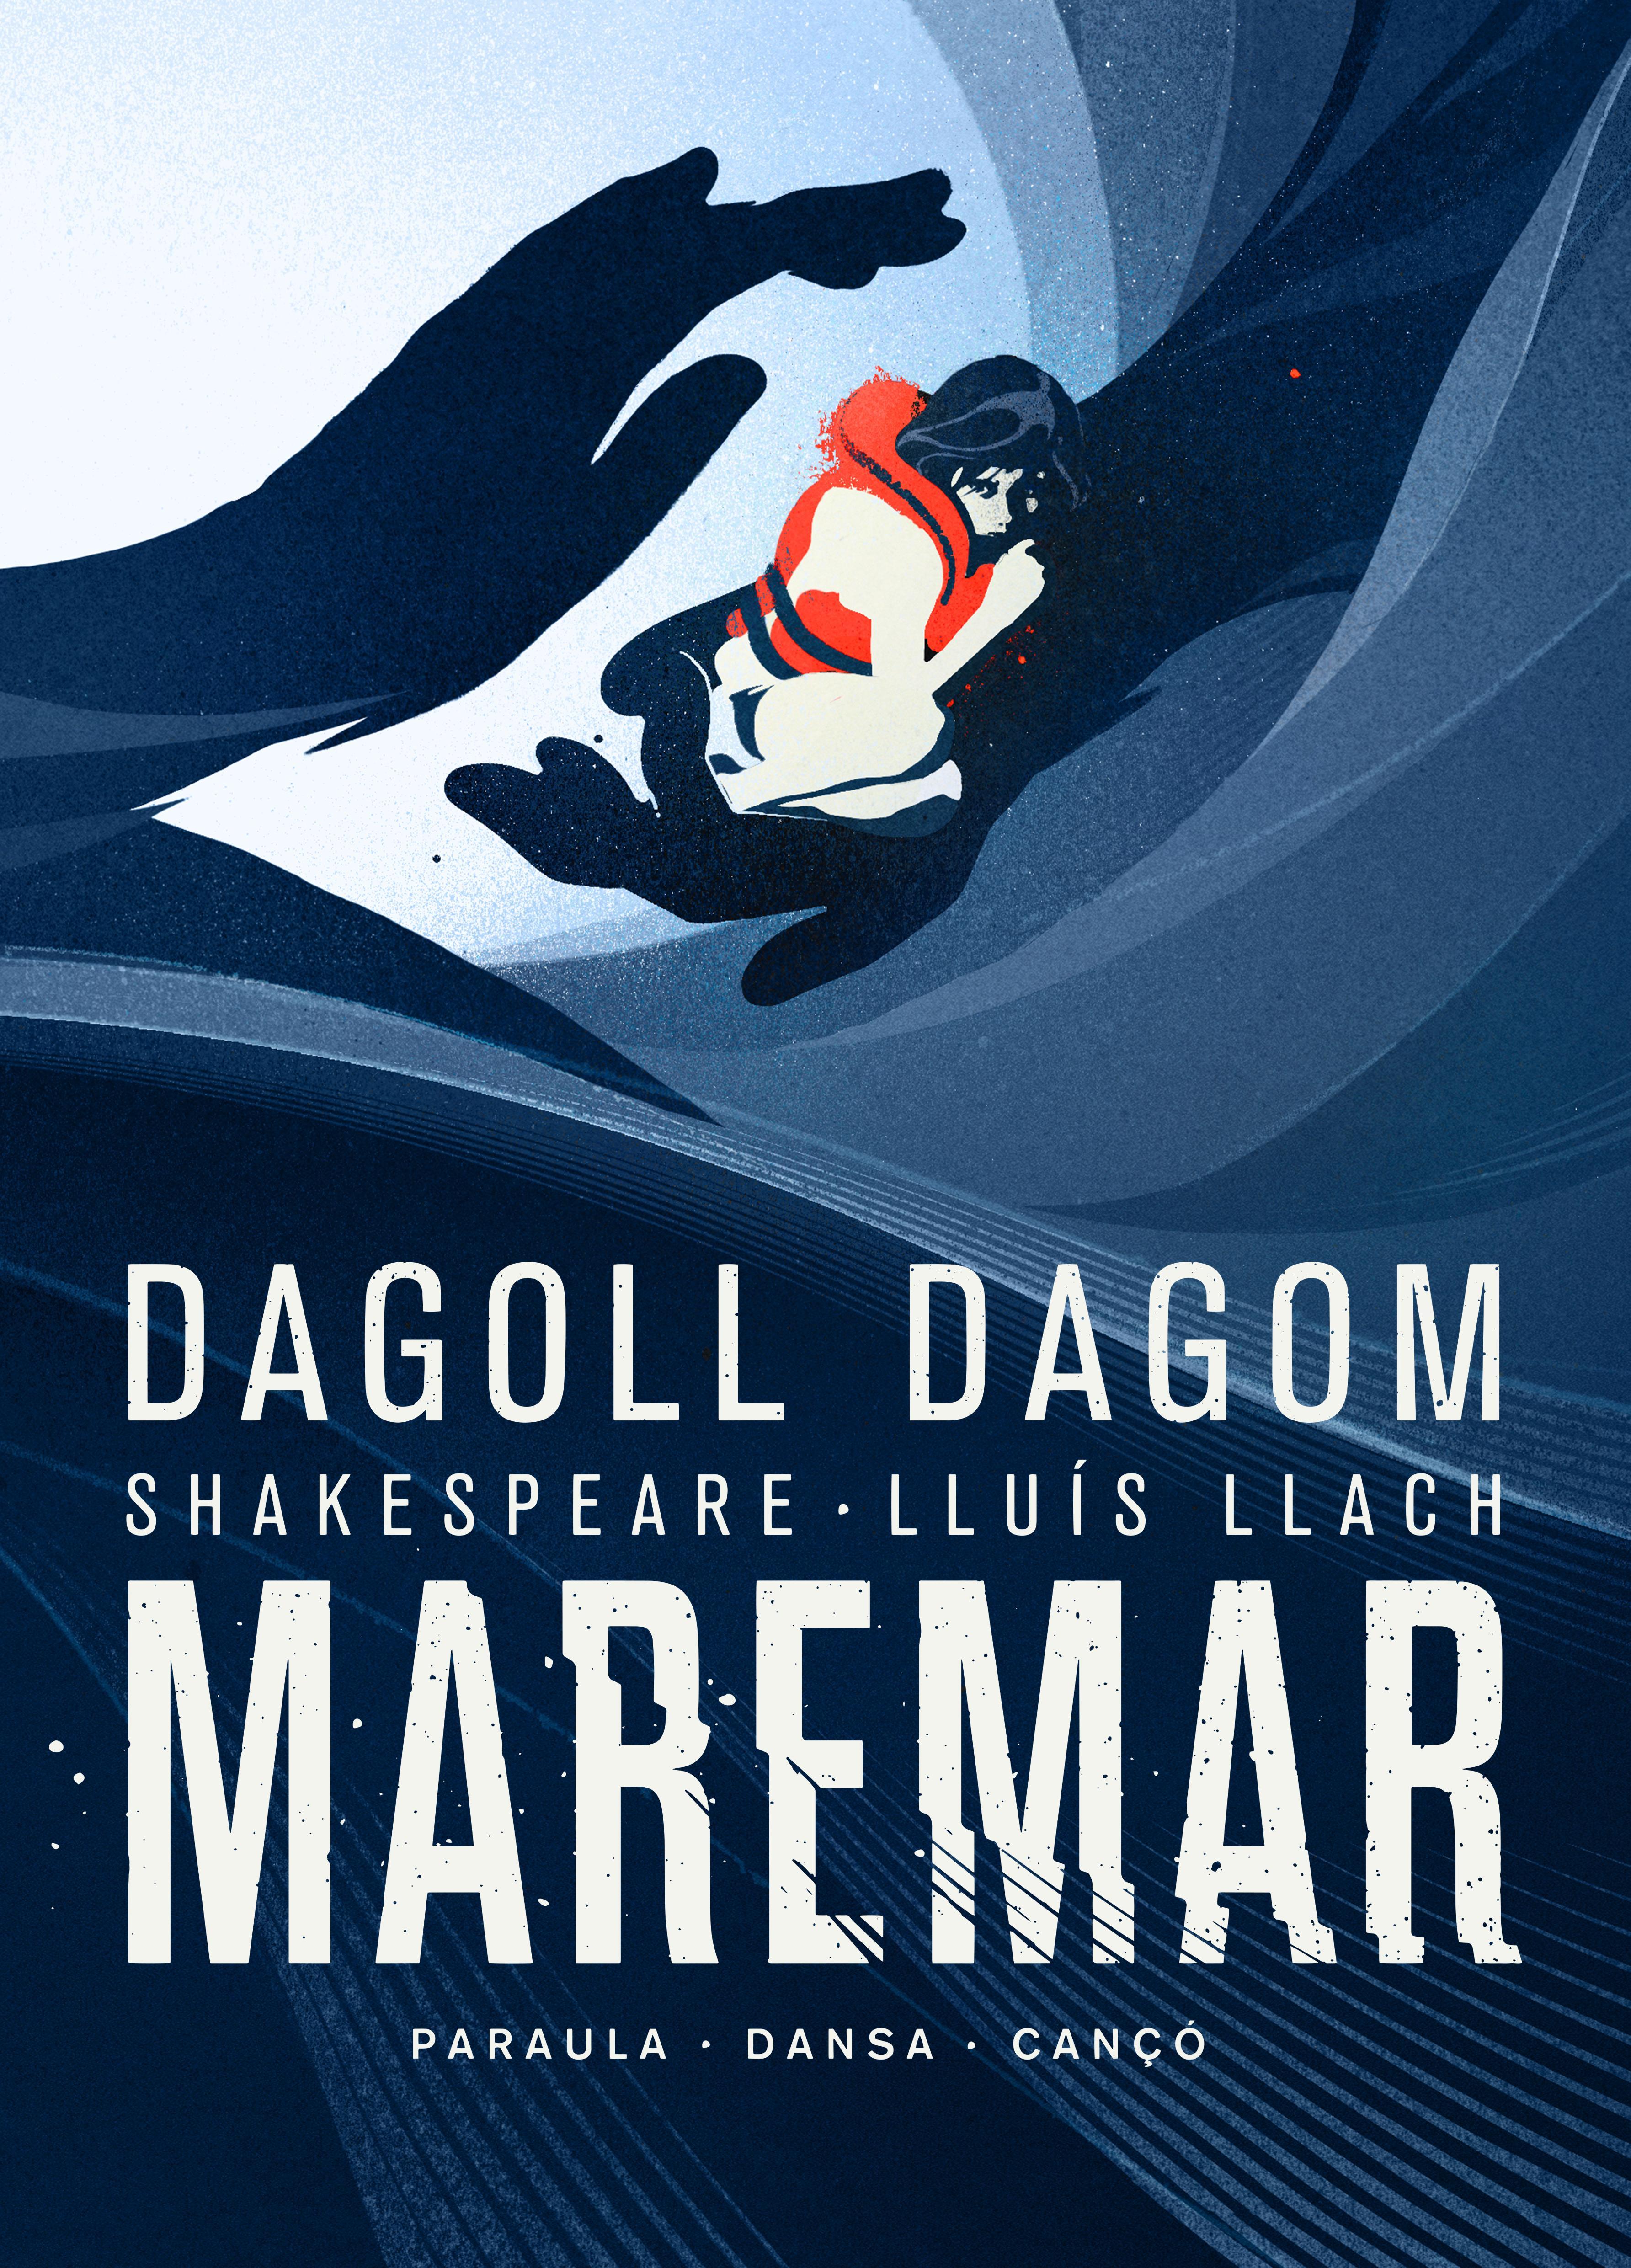 Maremar